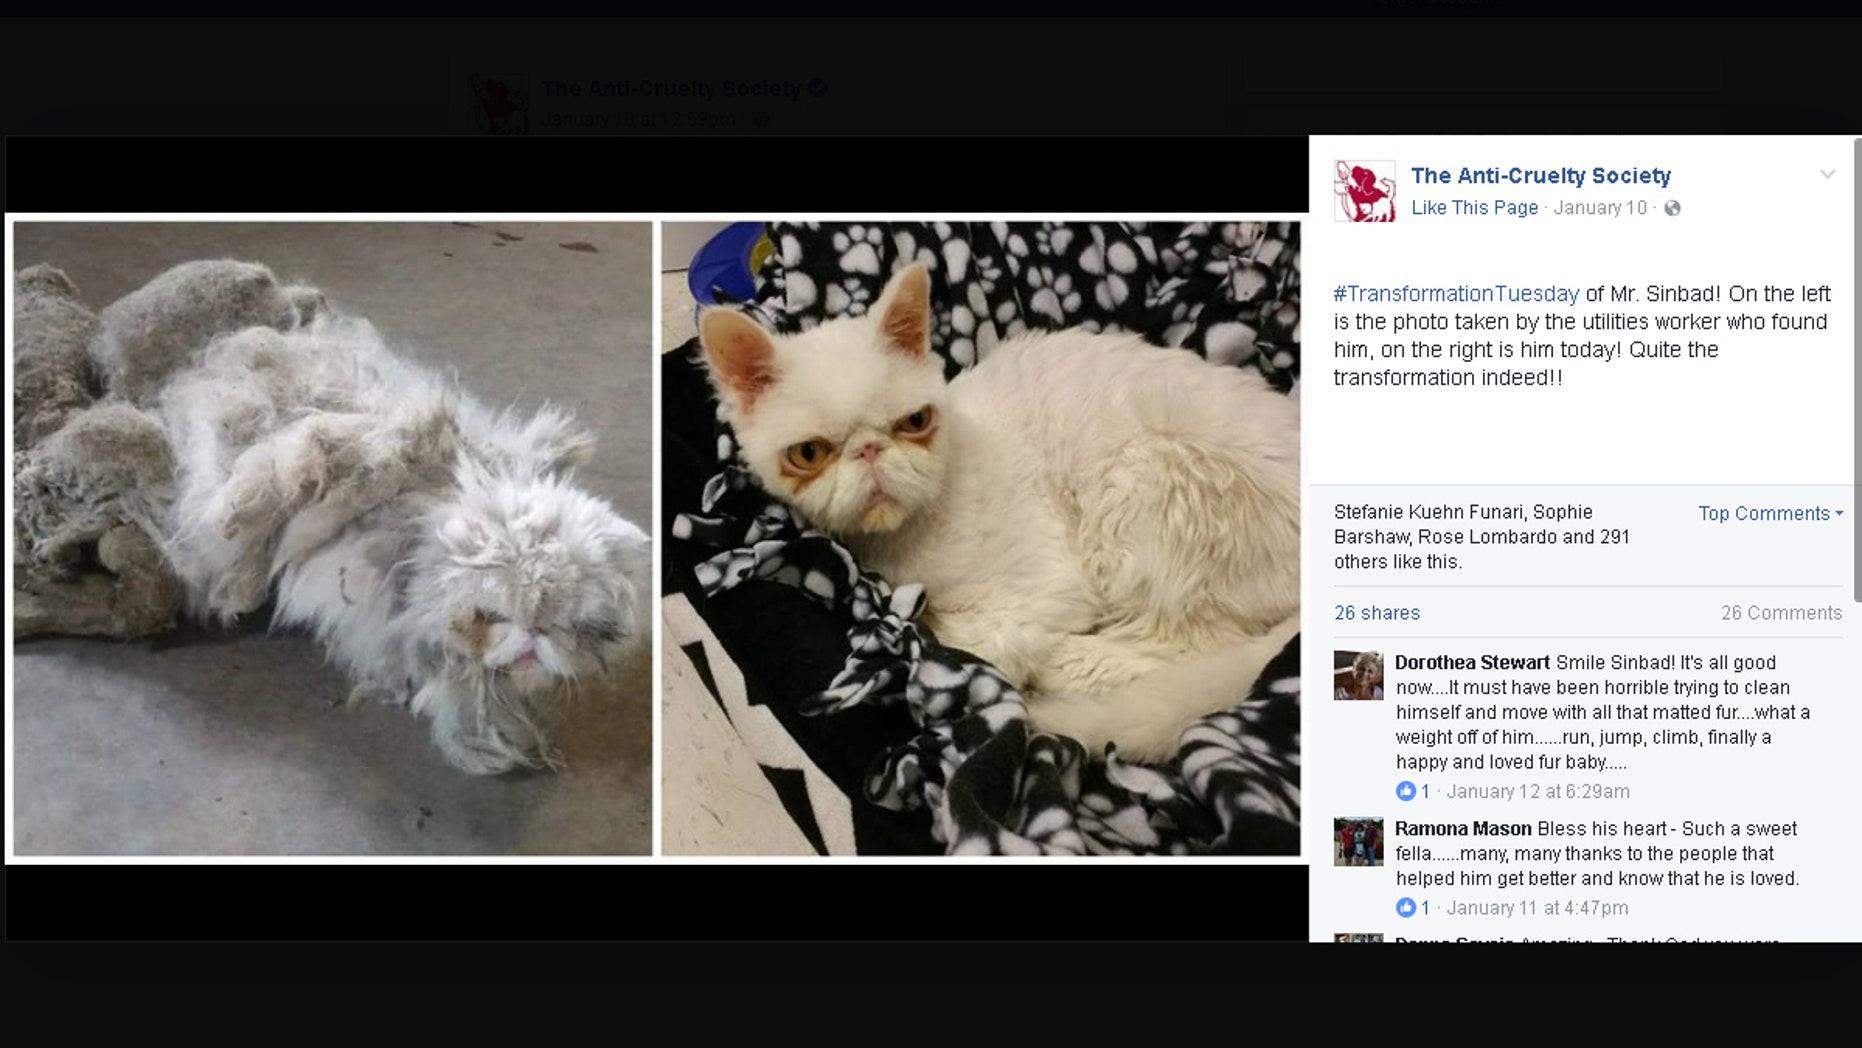 (Facebook/The Anti-Cruelty Society)